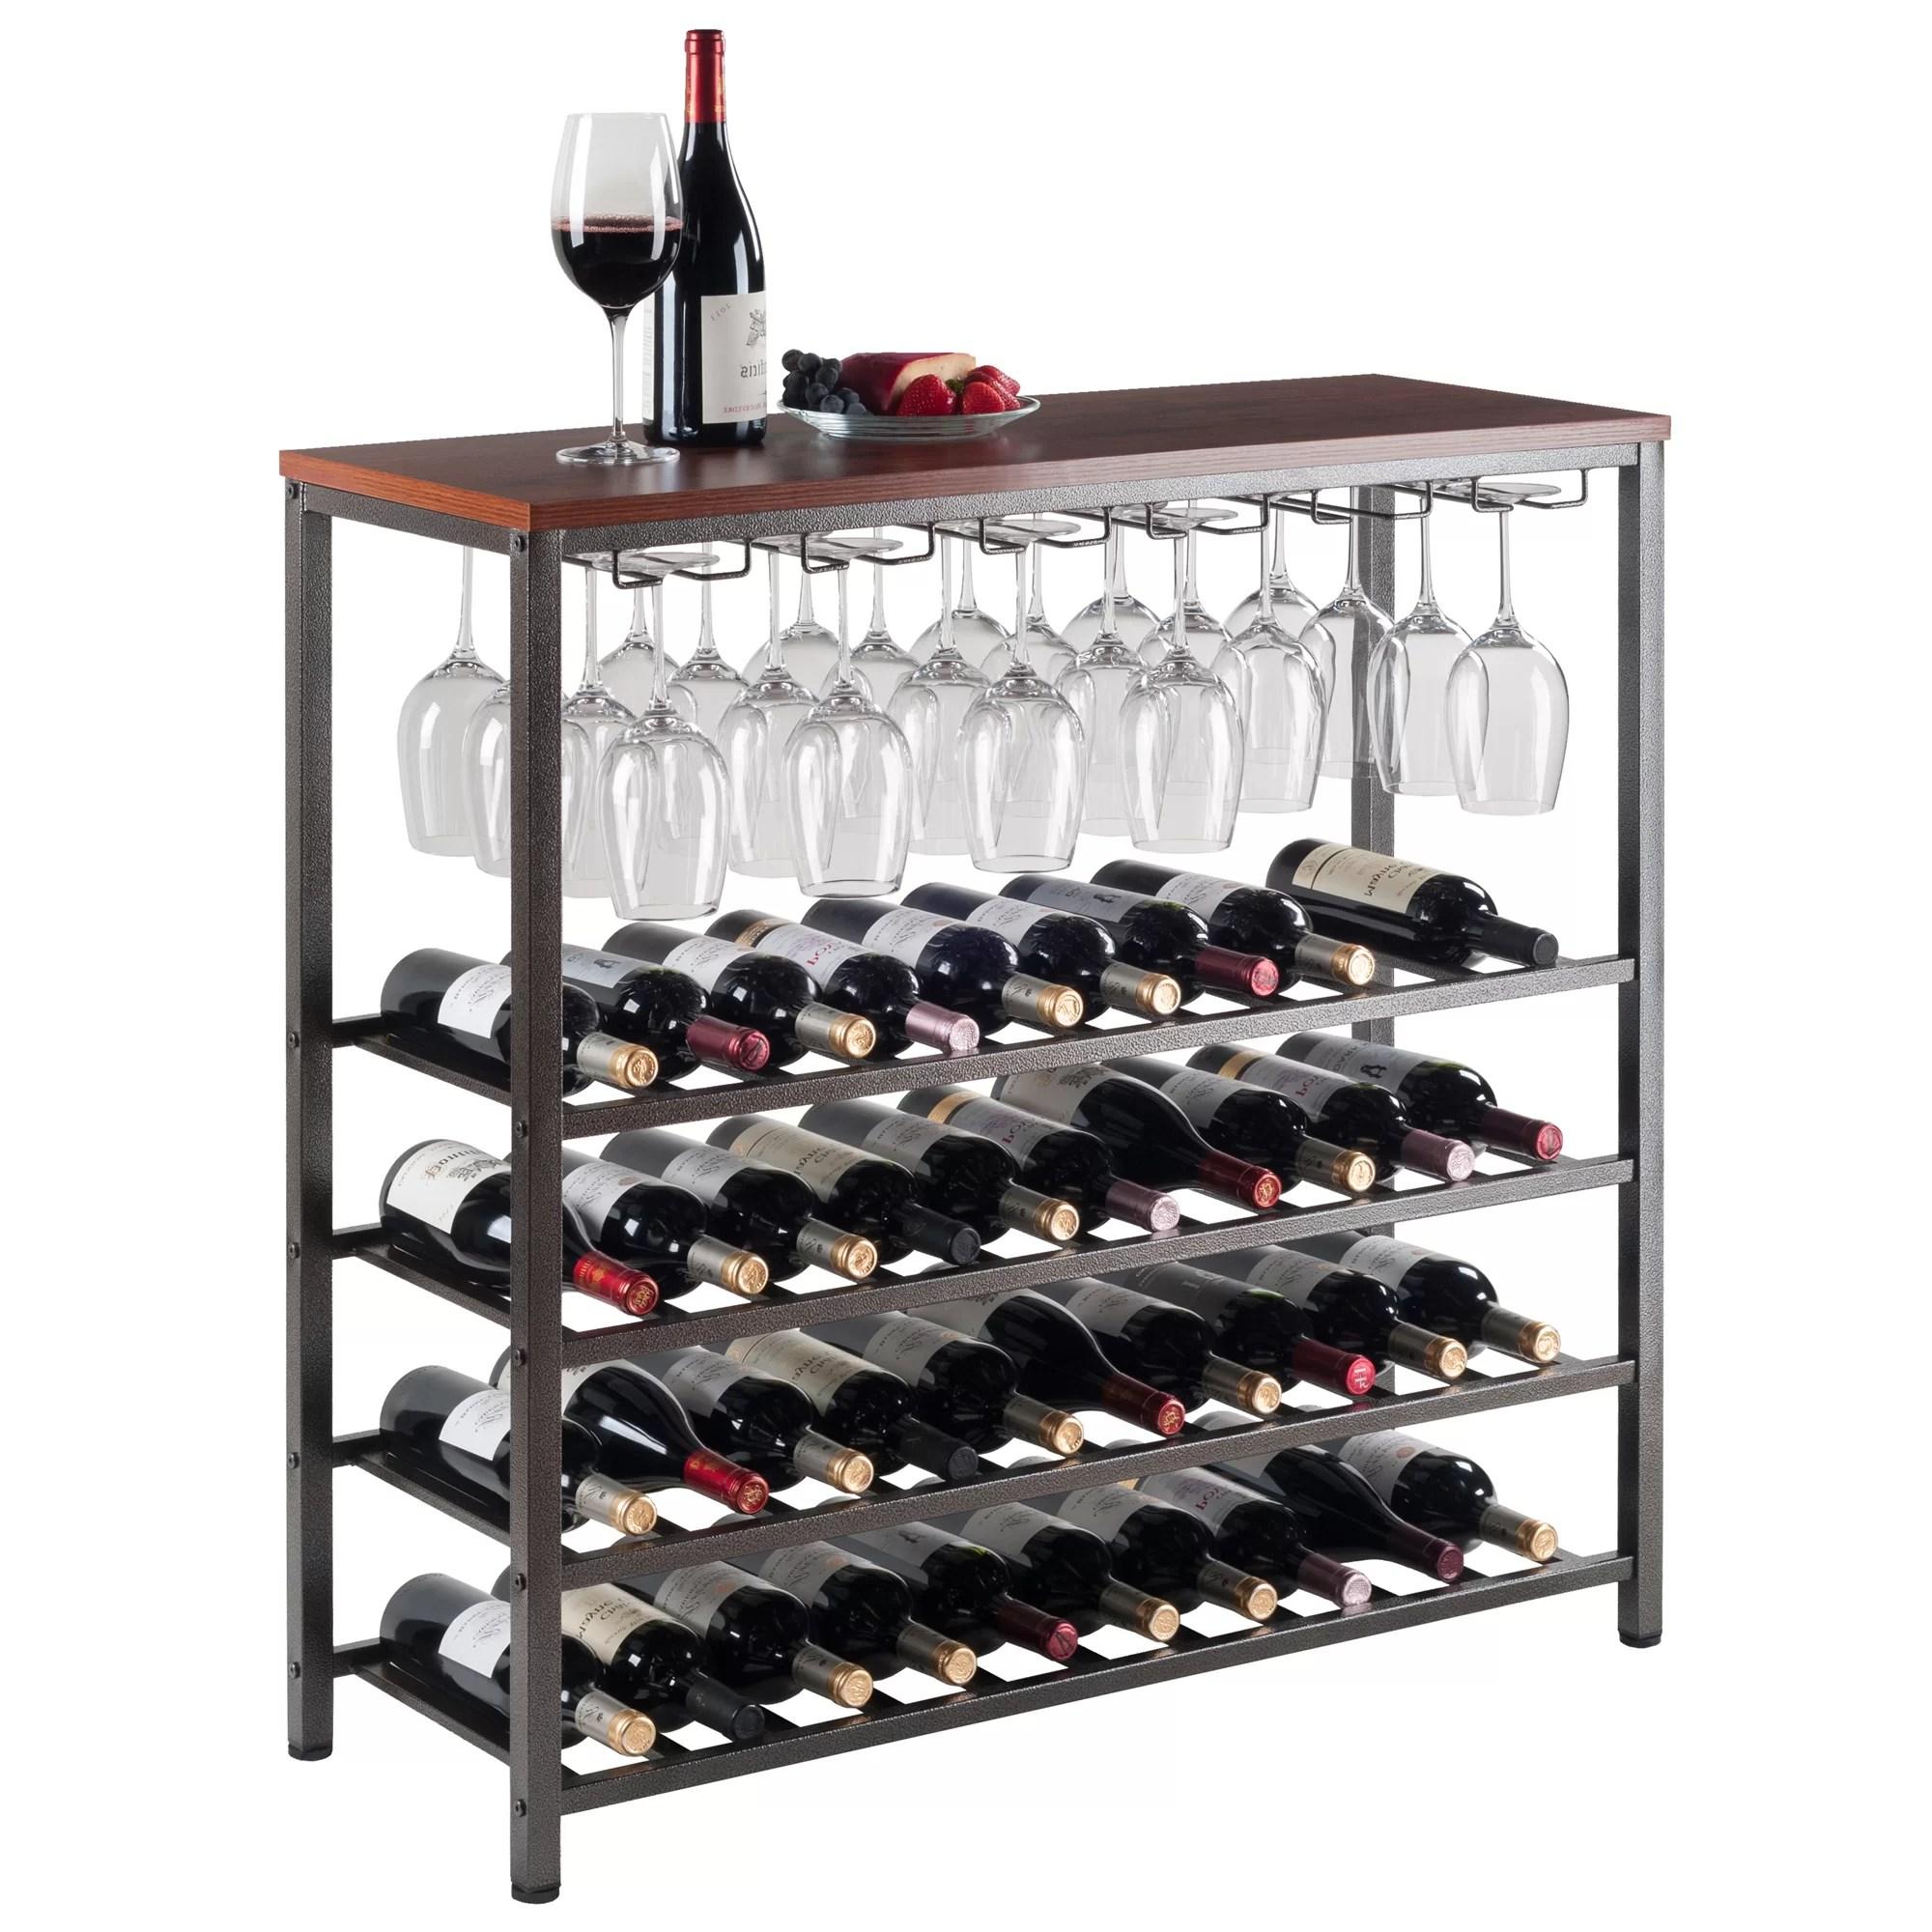 Darby Home Co Gillam 40 Bottle Wine Rack Reviews Wayfair